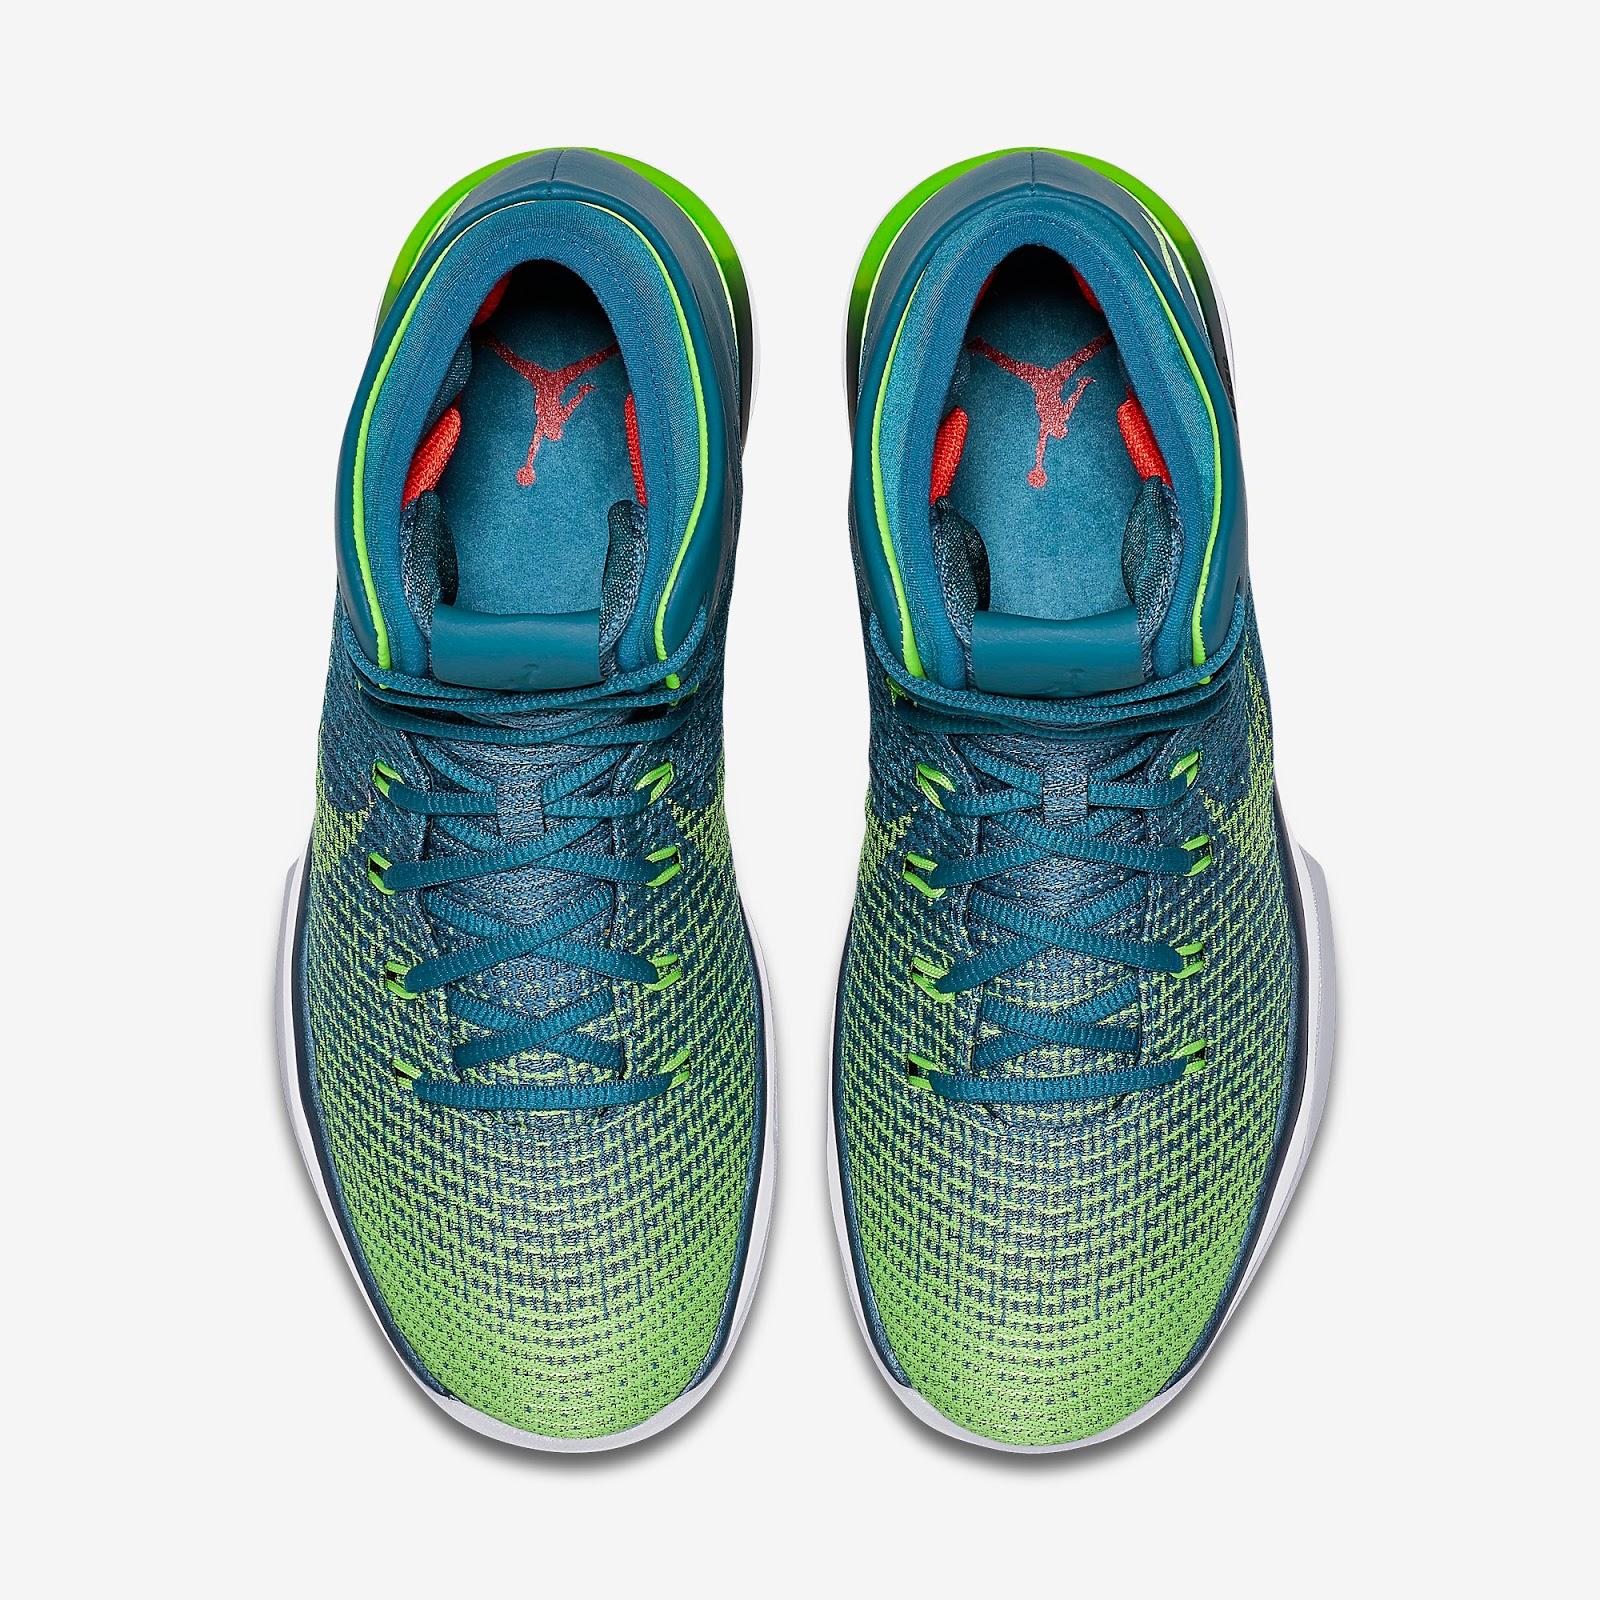 00cedede8a92e0 ... coupon code for ajordanxi your 1 source for sneaker release dates air  jordan xxxi ef6ca 524d5